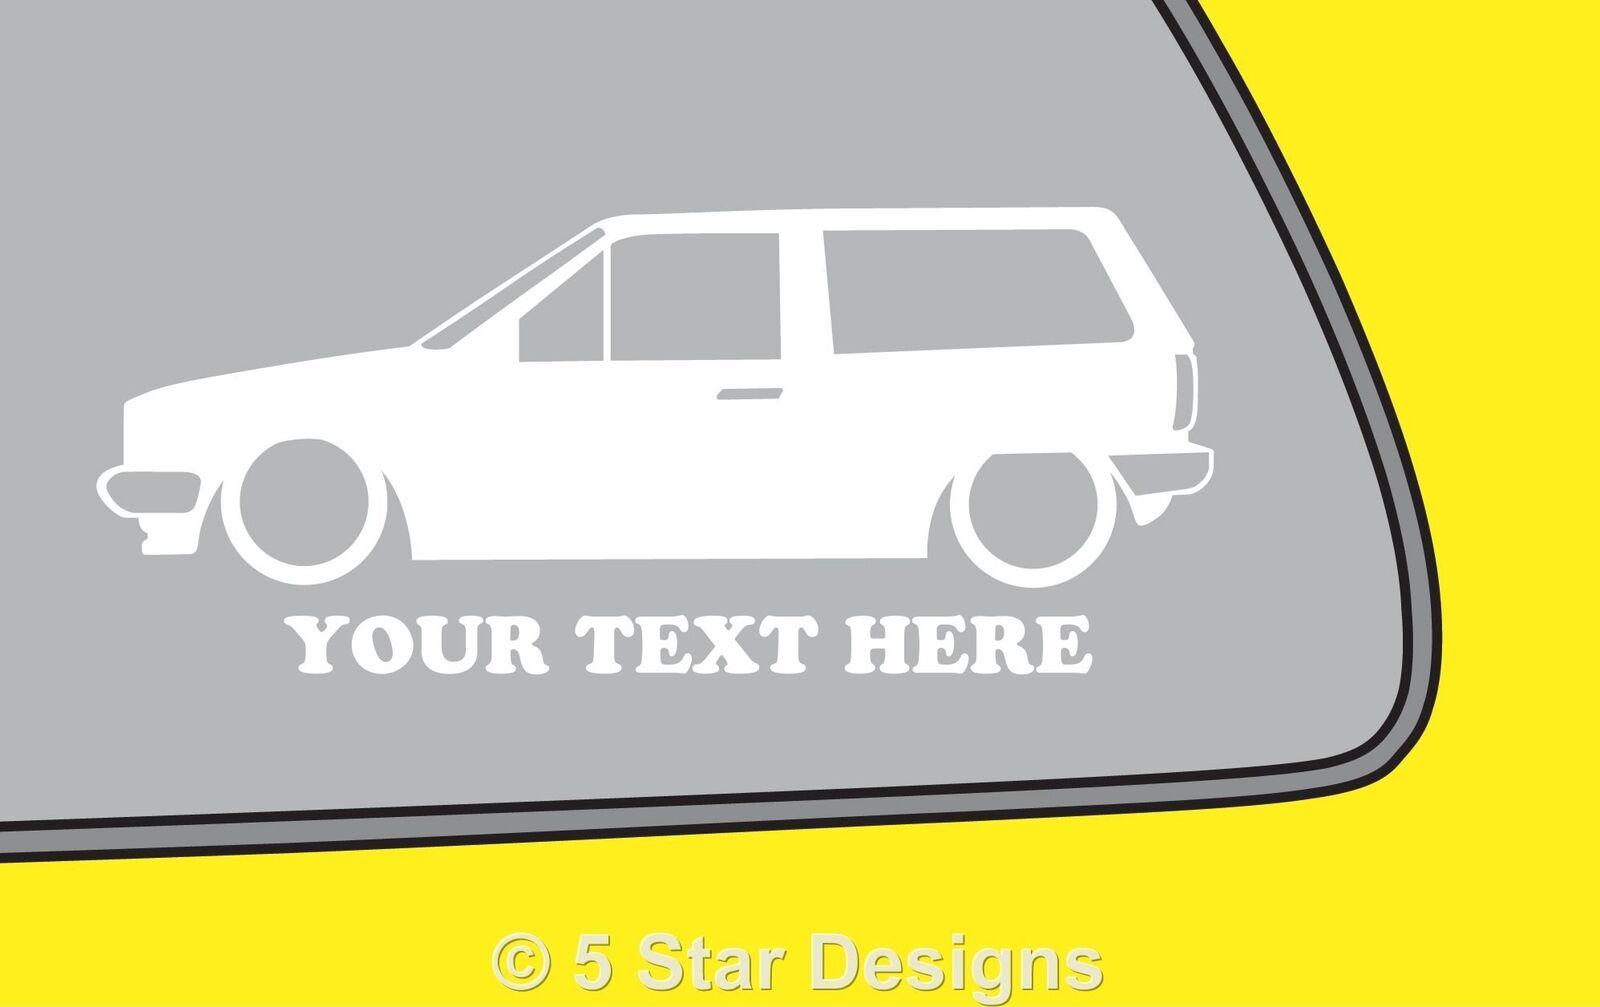 2x Custom Your Text Car Sticker For Vw Polo Mk2f Breadvan Squareback Wagon For Sale Ebay